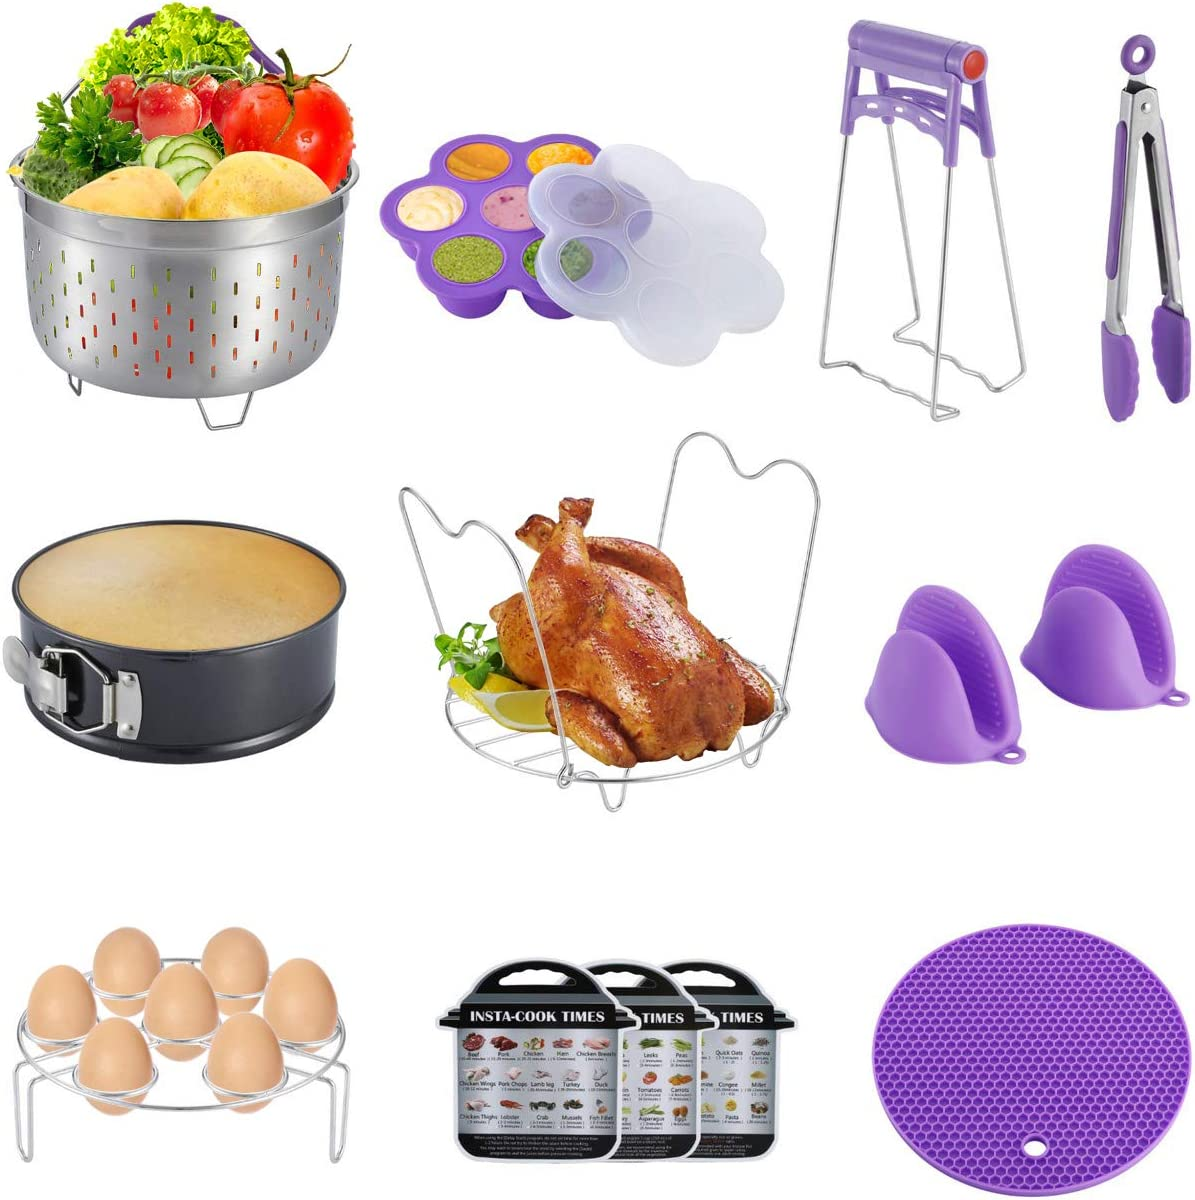 WarmHut 10 Pieces Electric Pressure Cooker Accessories Set - Compatible With 6QT 8QT Instapot, Steamer Basket, Springform Pan, Egg Rack, 3 Magnetic Cheat Sheets of Vegetables/Grains/Meat